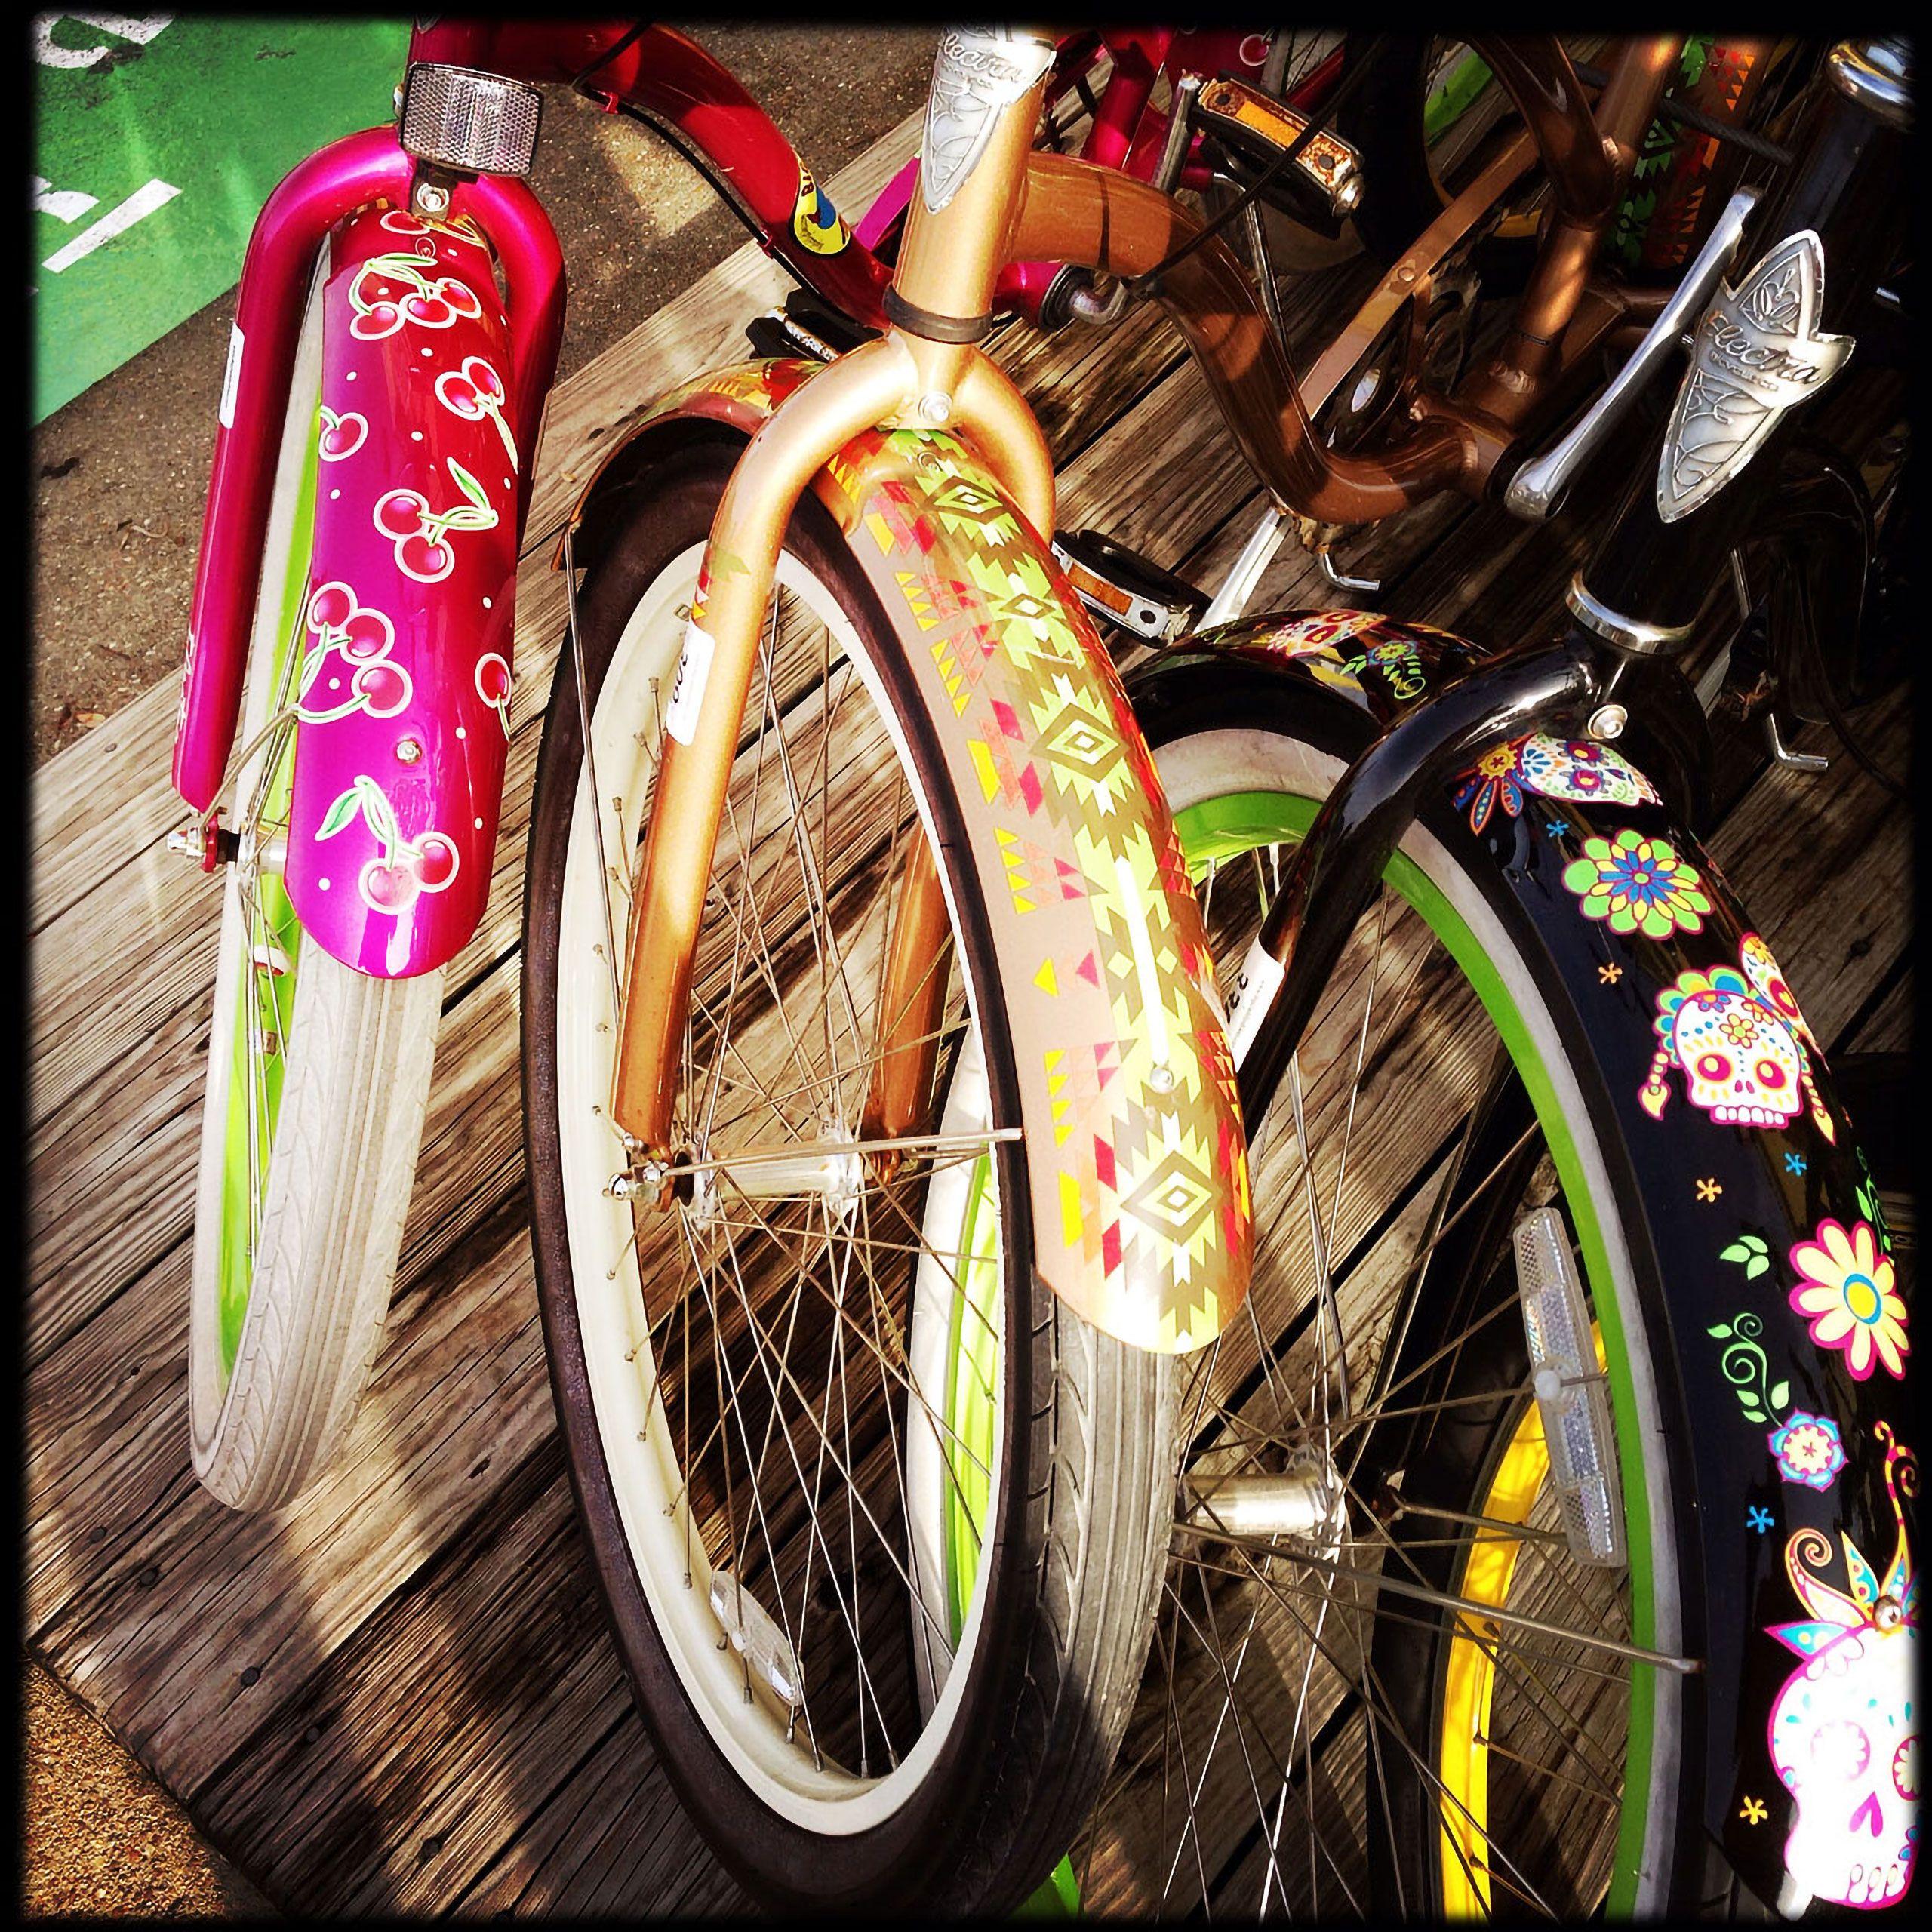 Big Daddy's bike shop santa rosa beach flordai